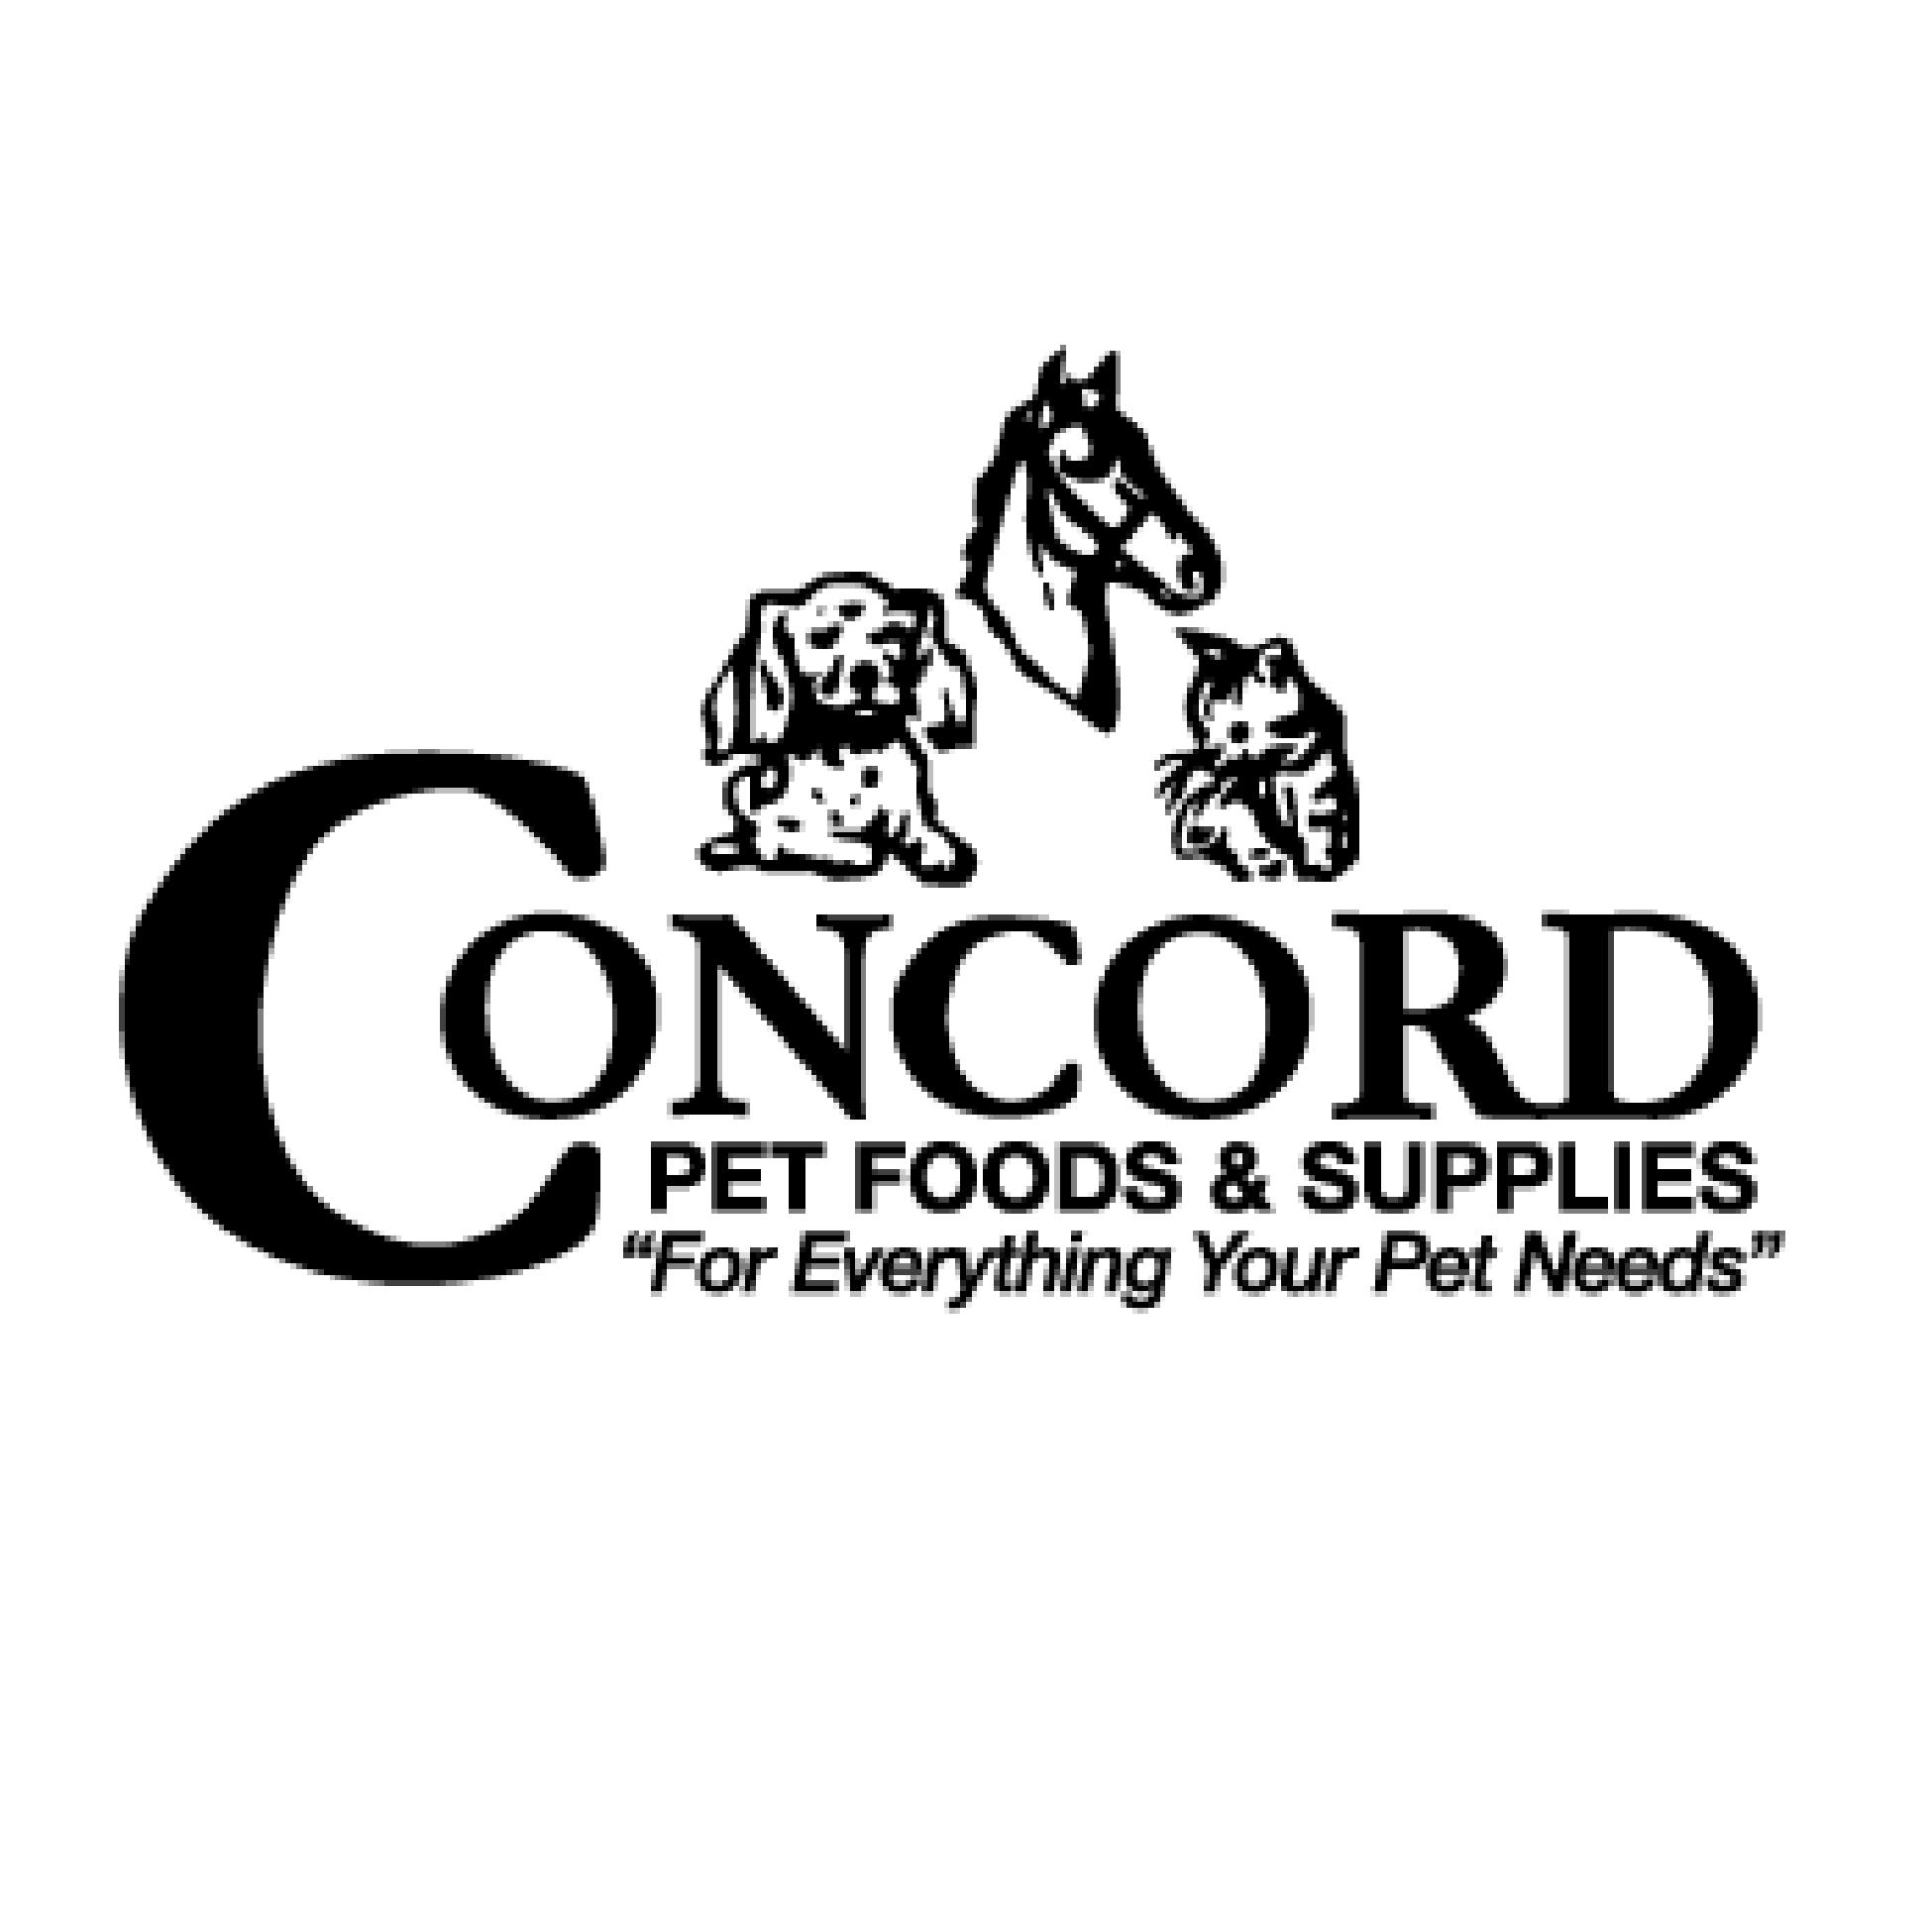 Concord Pet Foods & Supplies logo